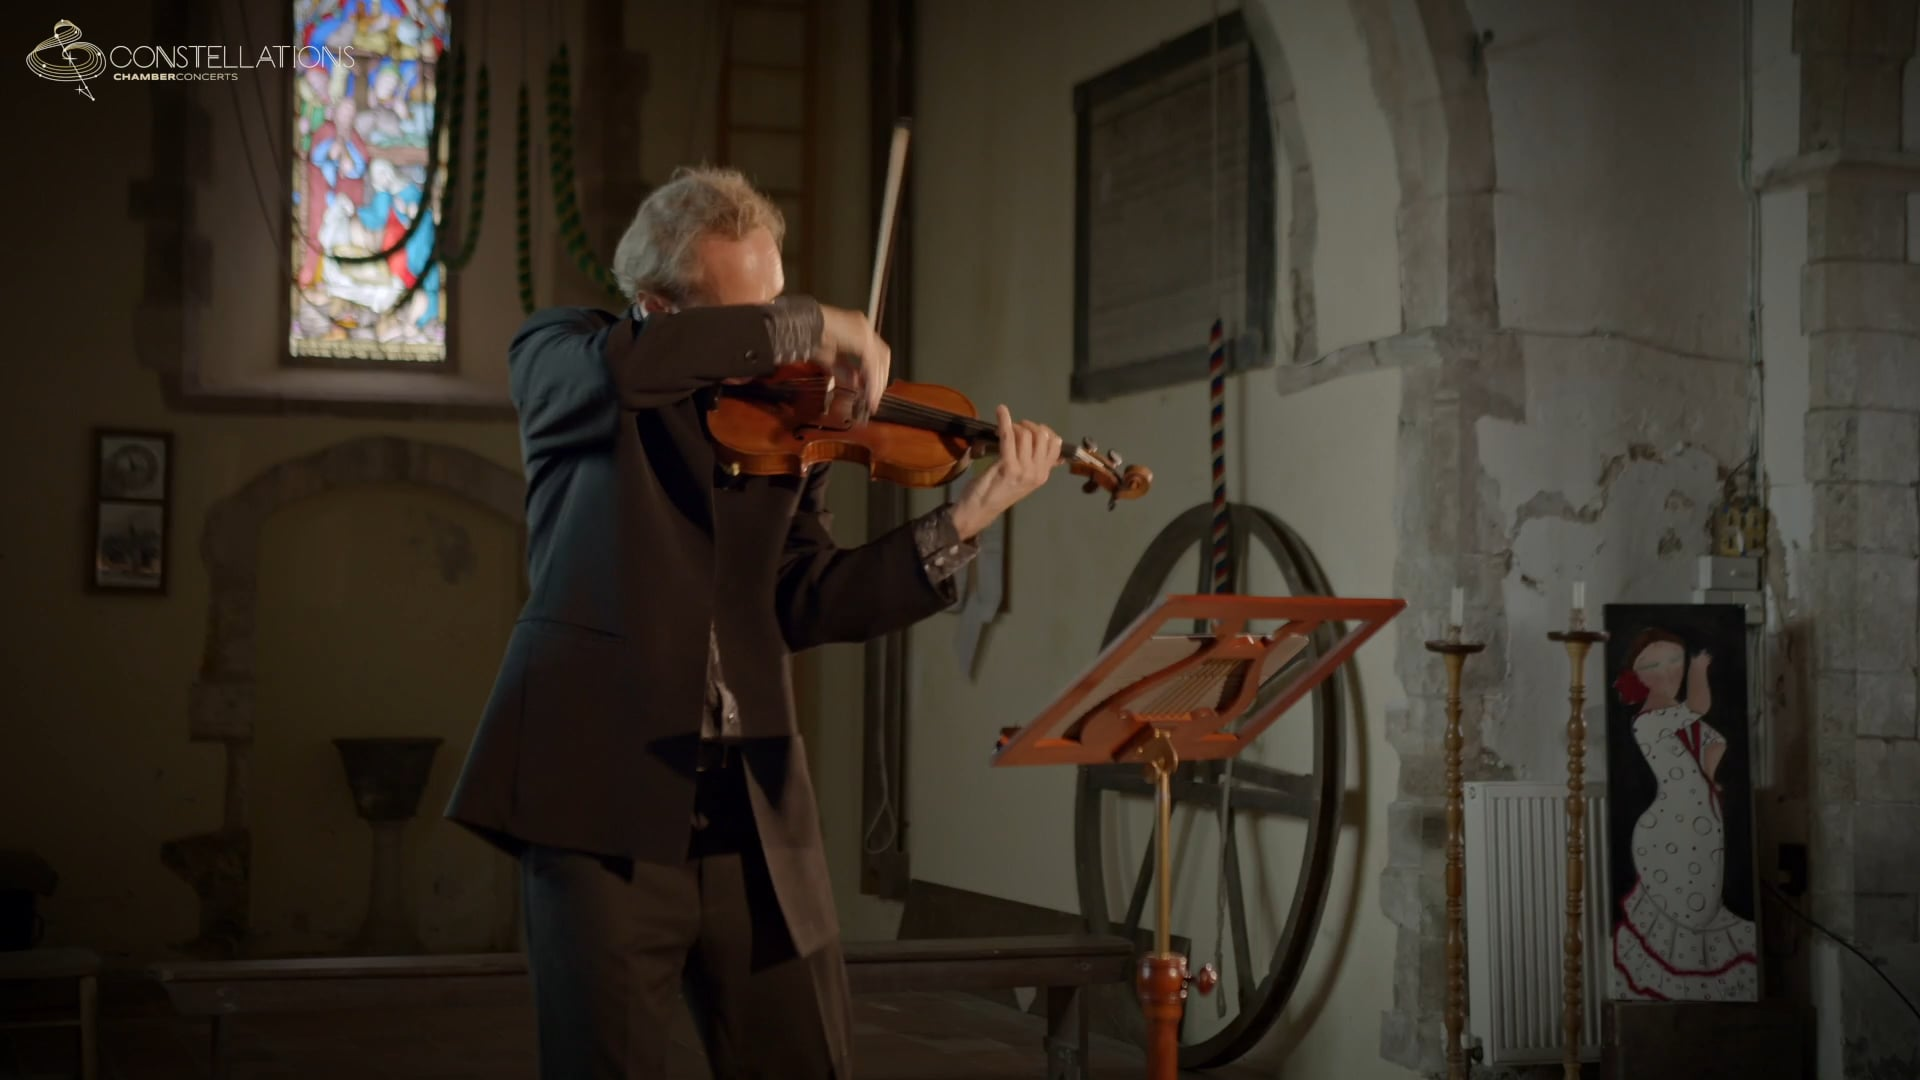 Anthony Marwood - Prokofiev: Sonata for Solo Violin, III. Con brio